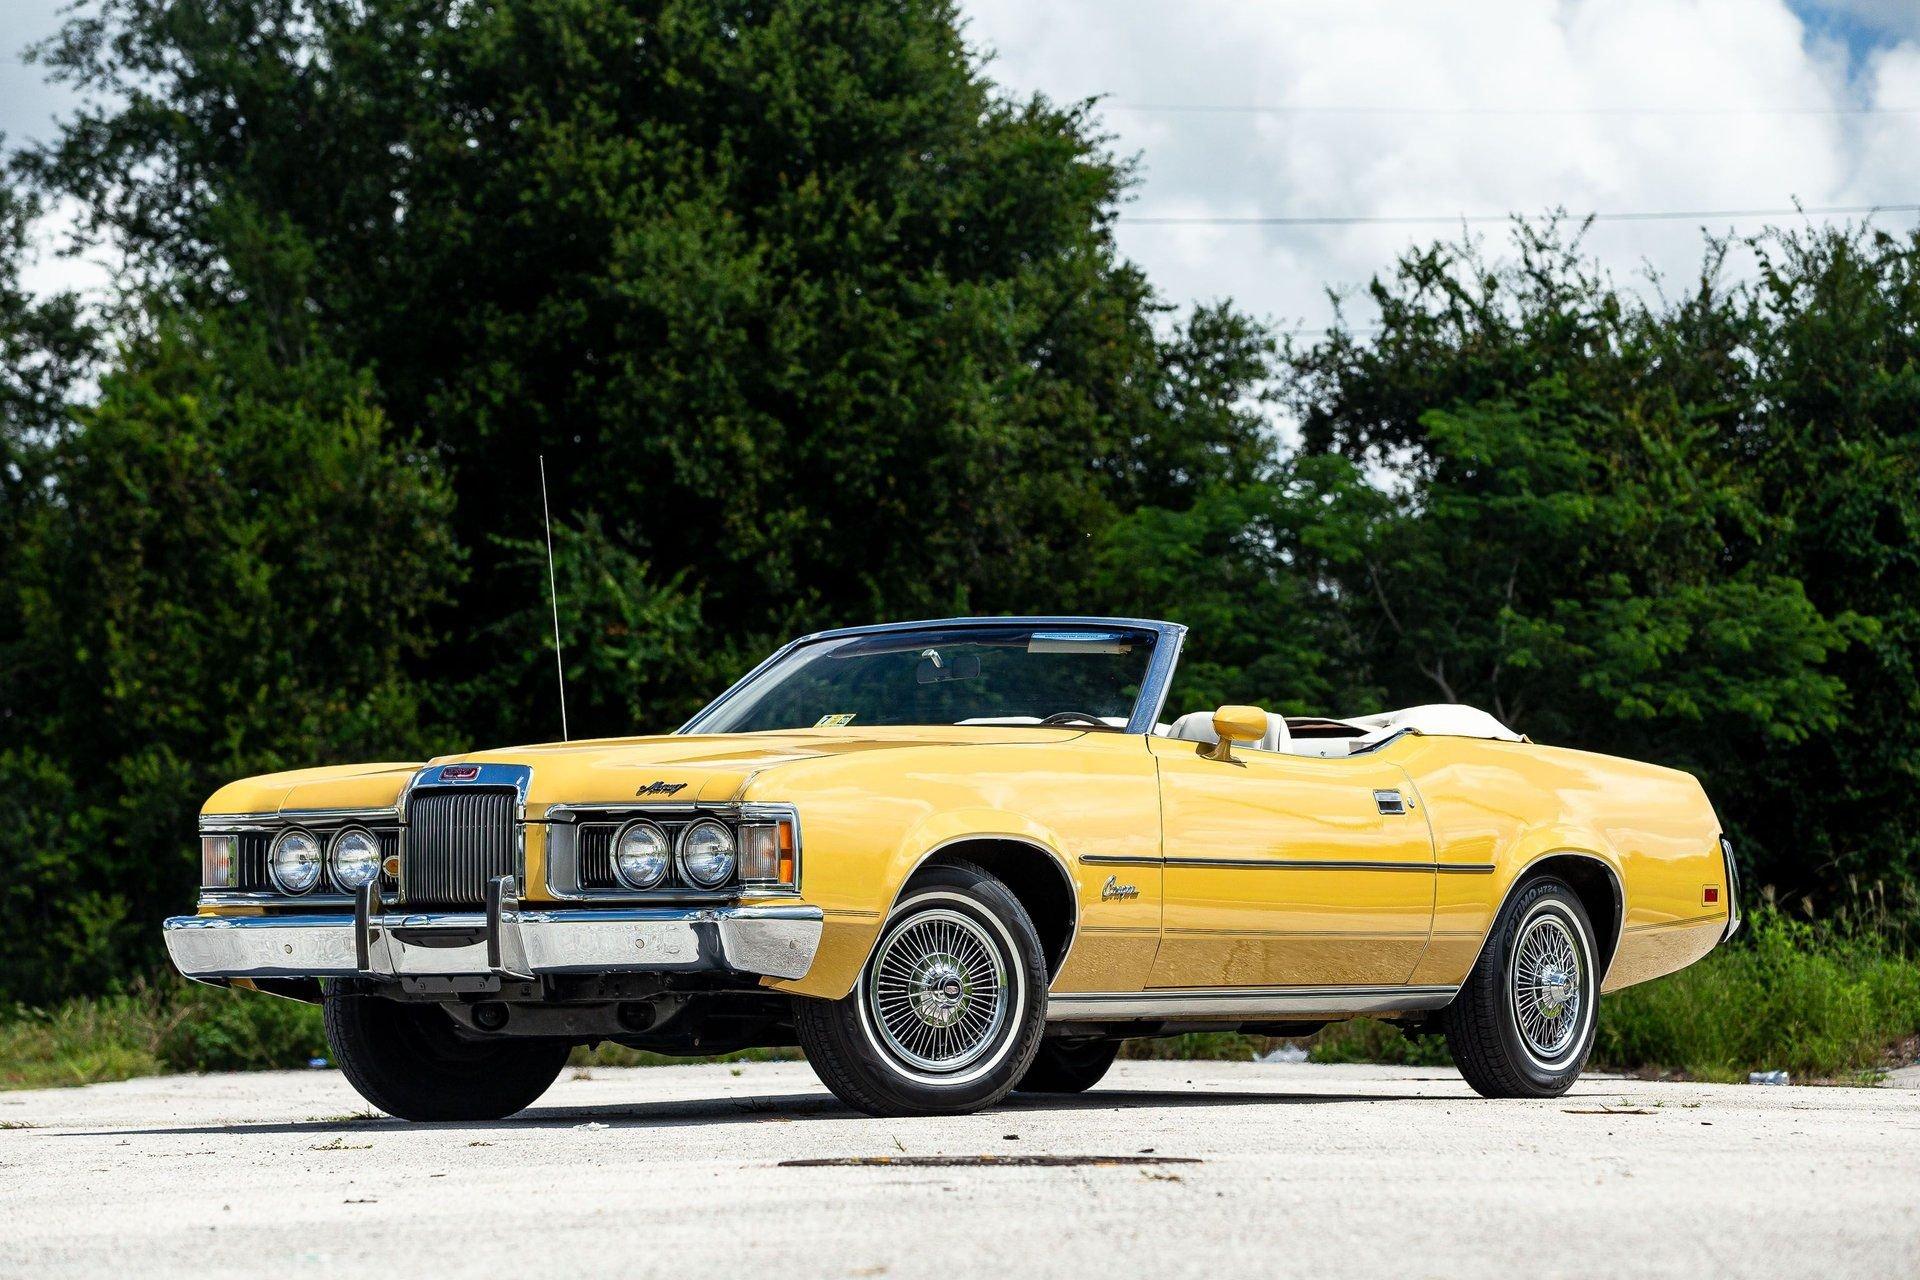 1973 mercury cougar xr 7 convertible